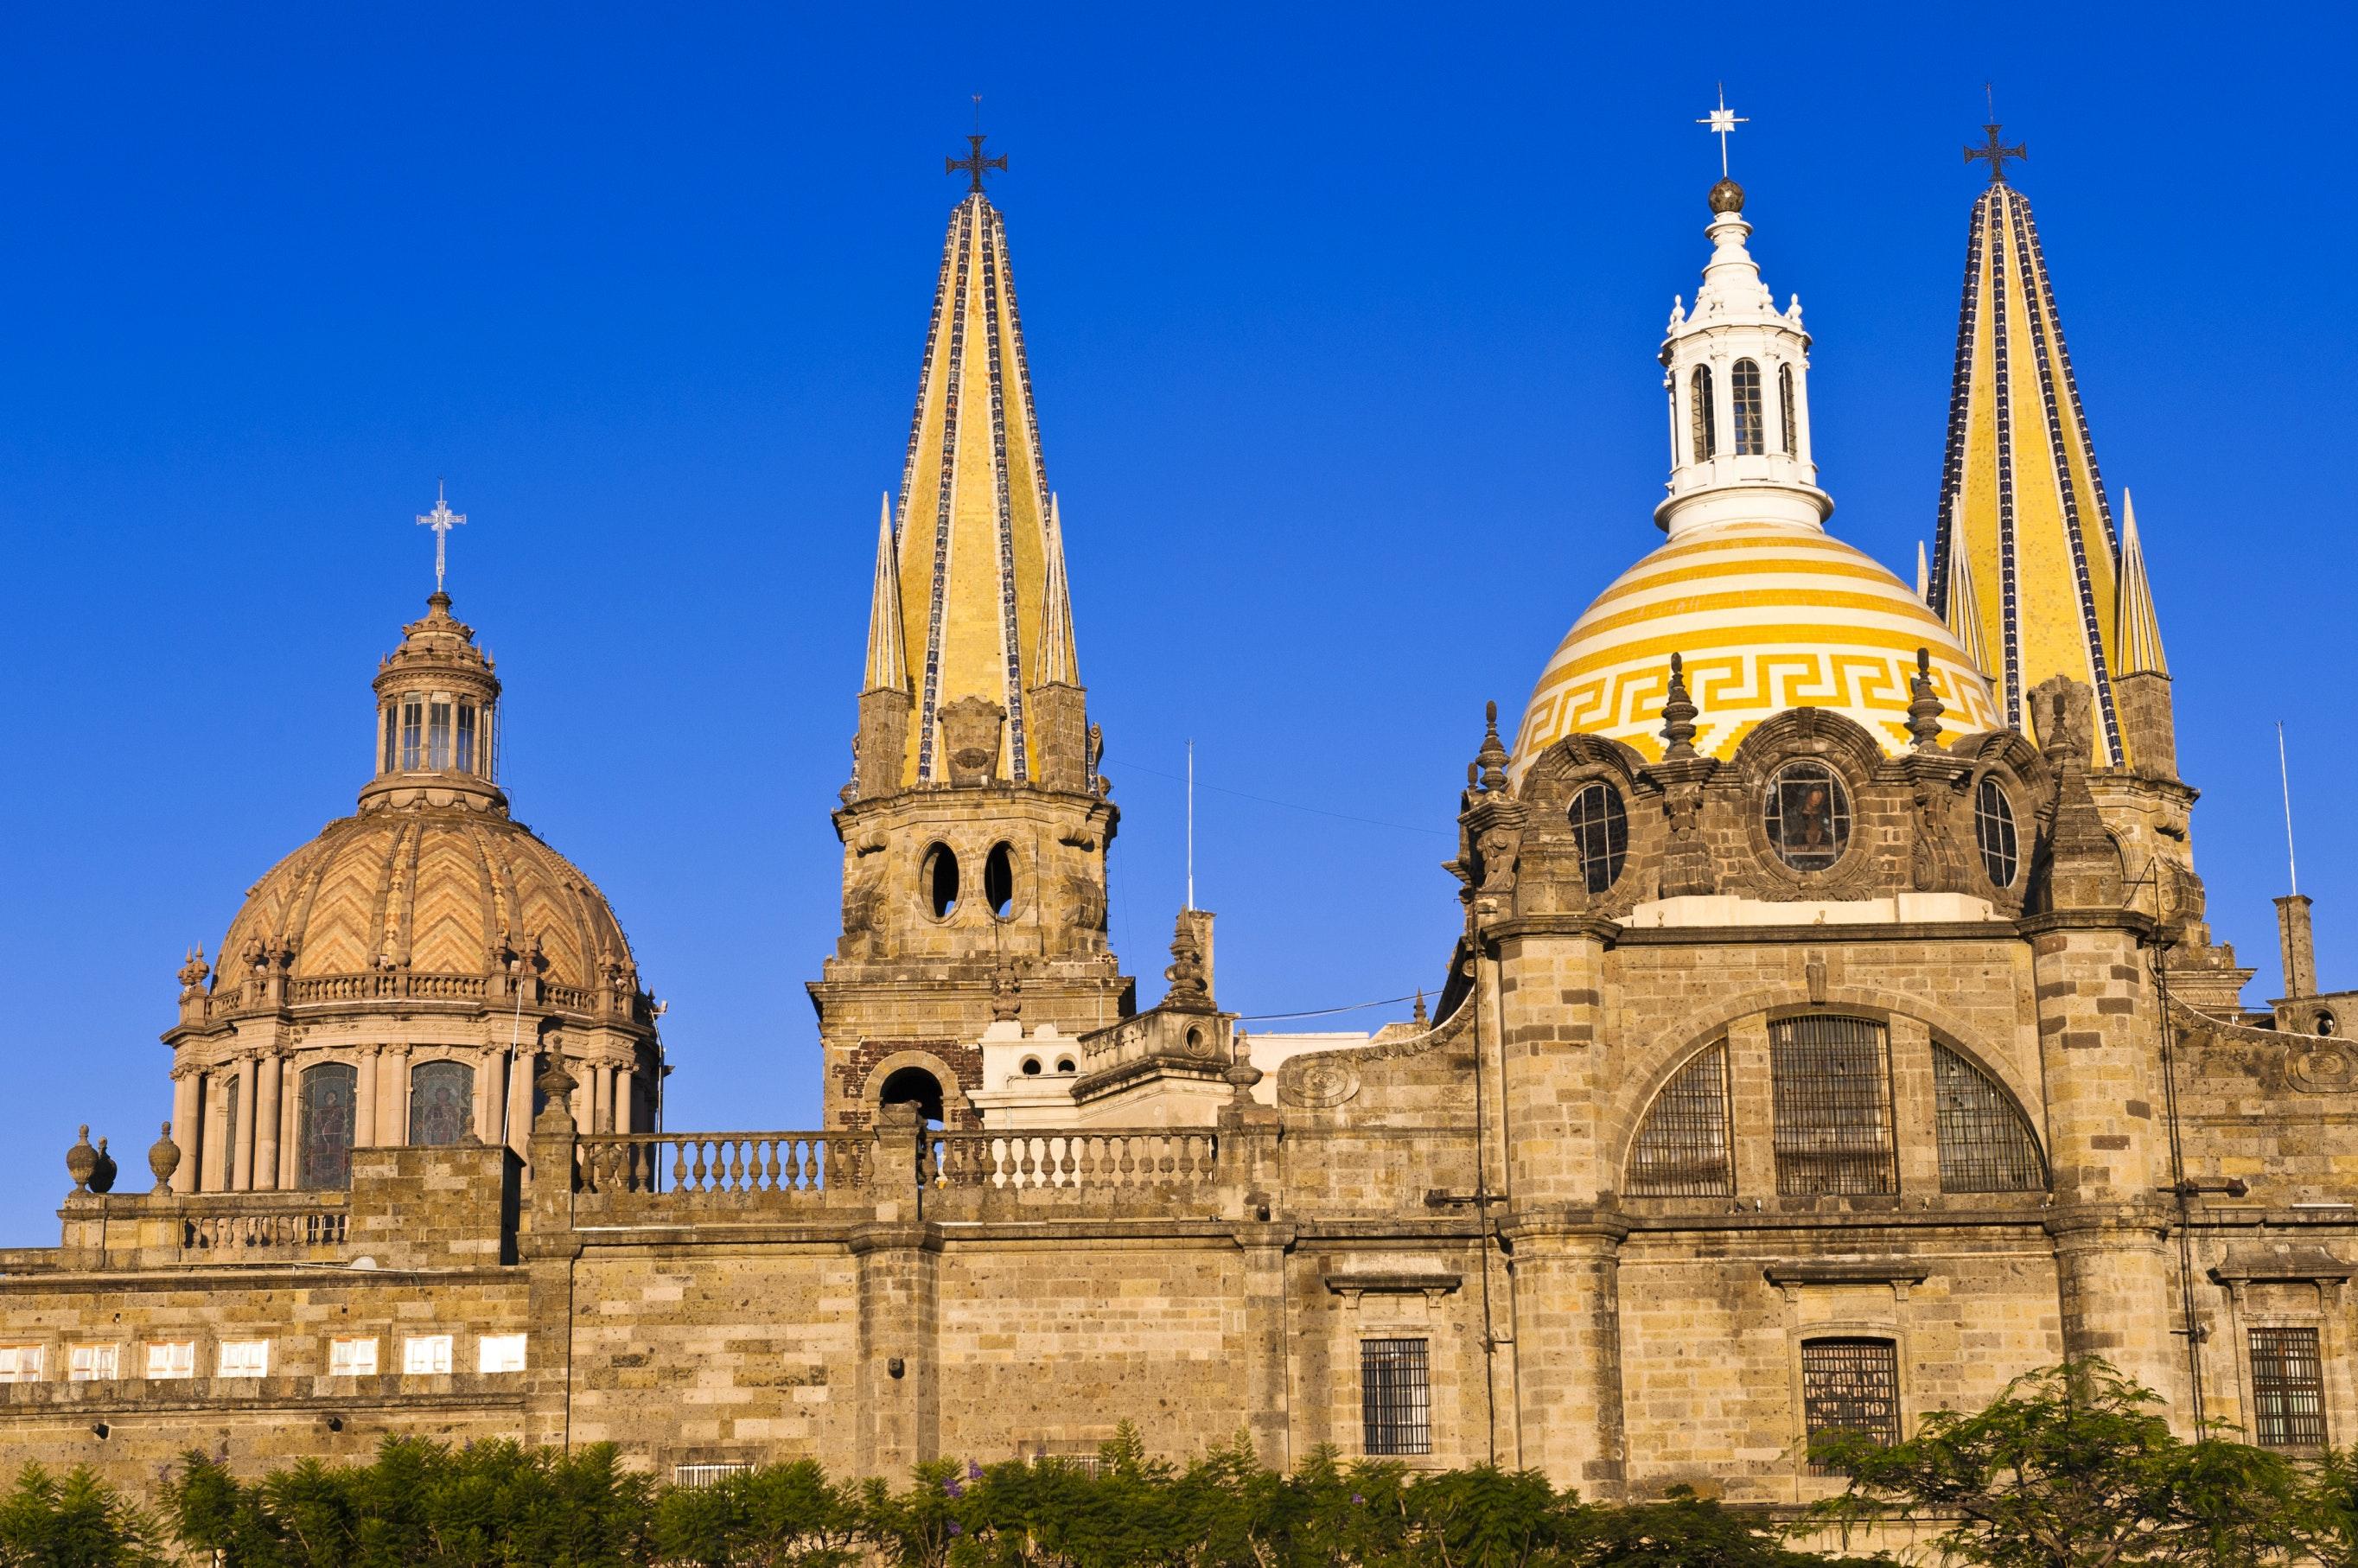 Top things to do in Guadalajara, Mexico